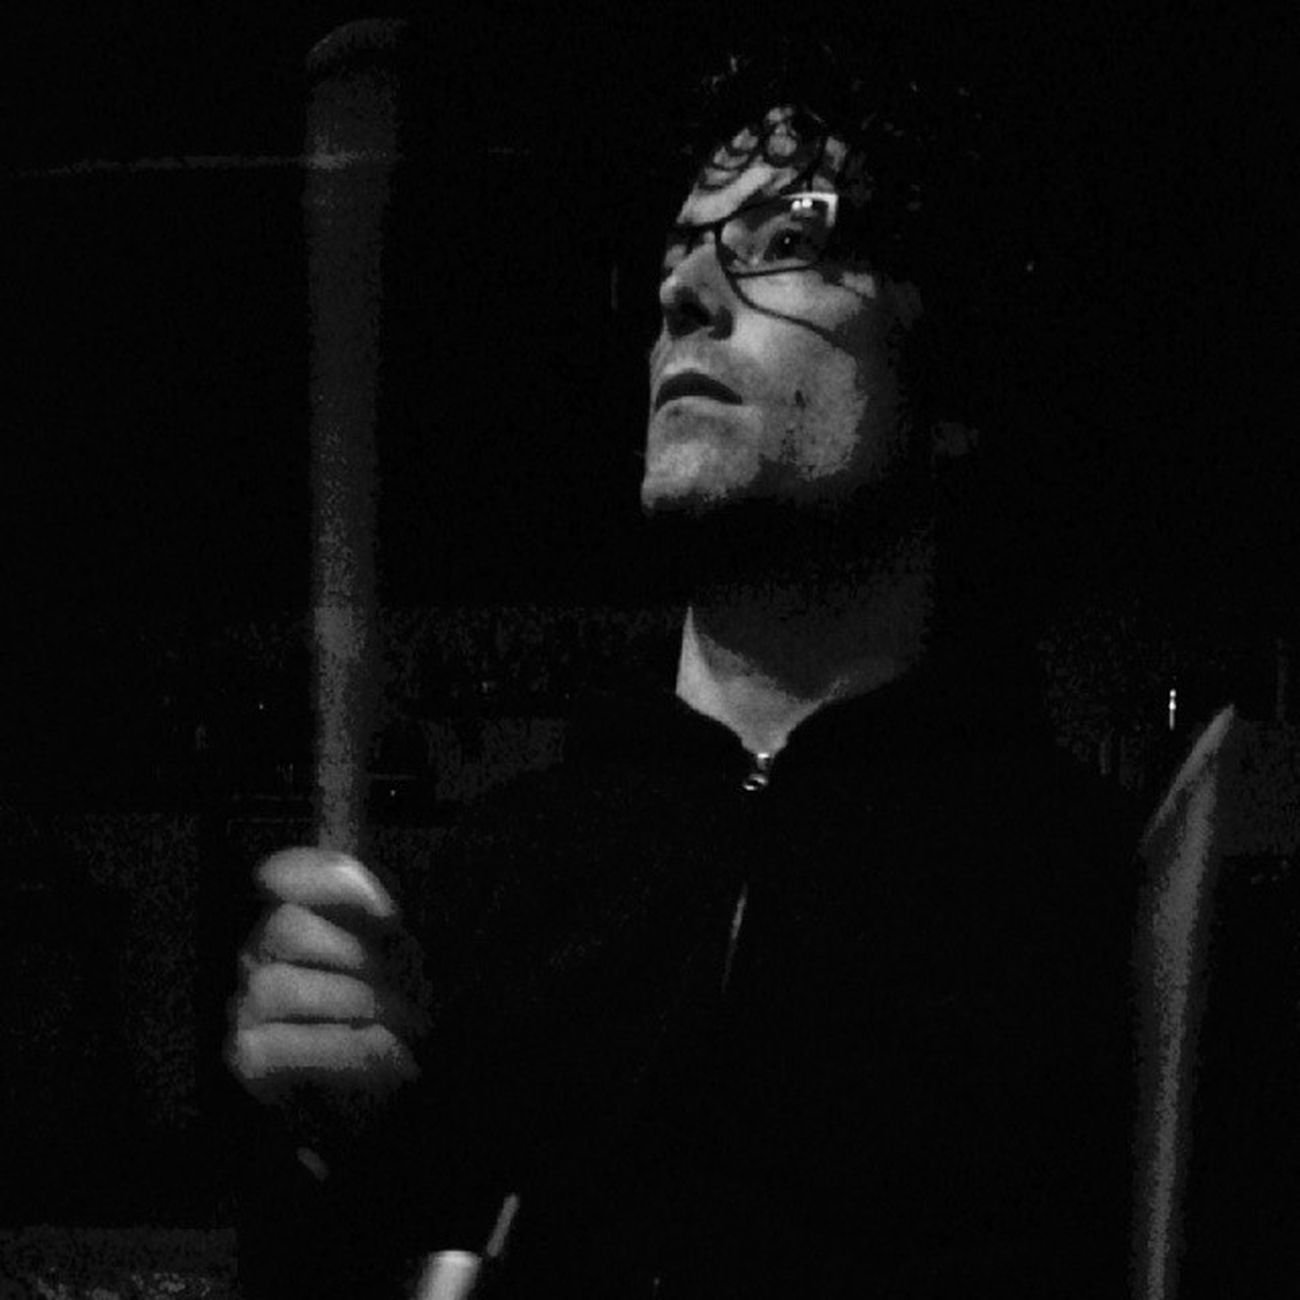 Drums Drummerboy TardaDeDissabteAmbElsAmics Guitarhero Wii